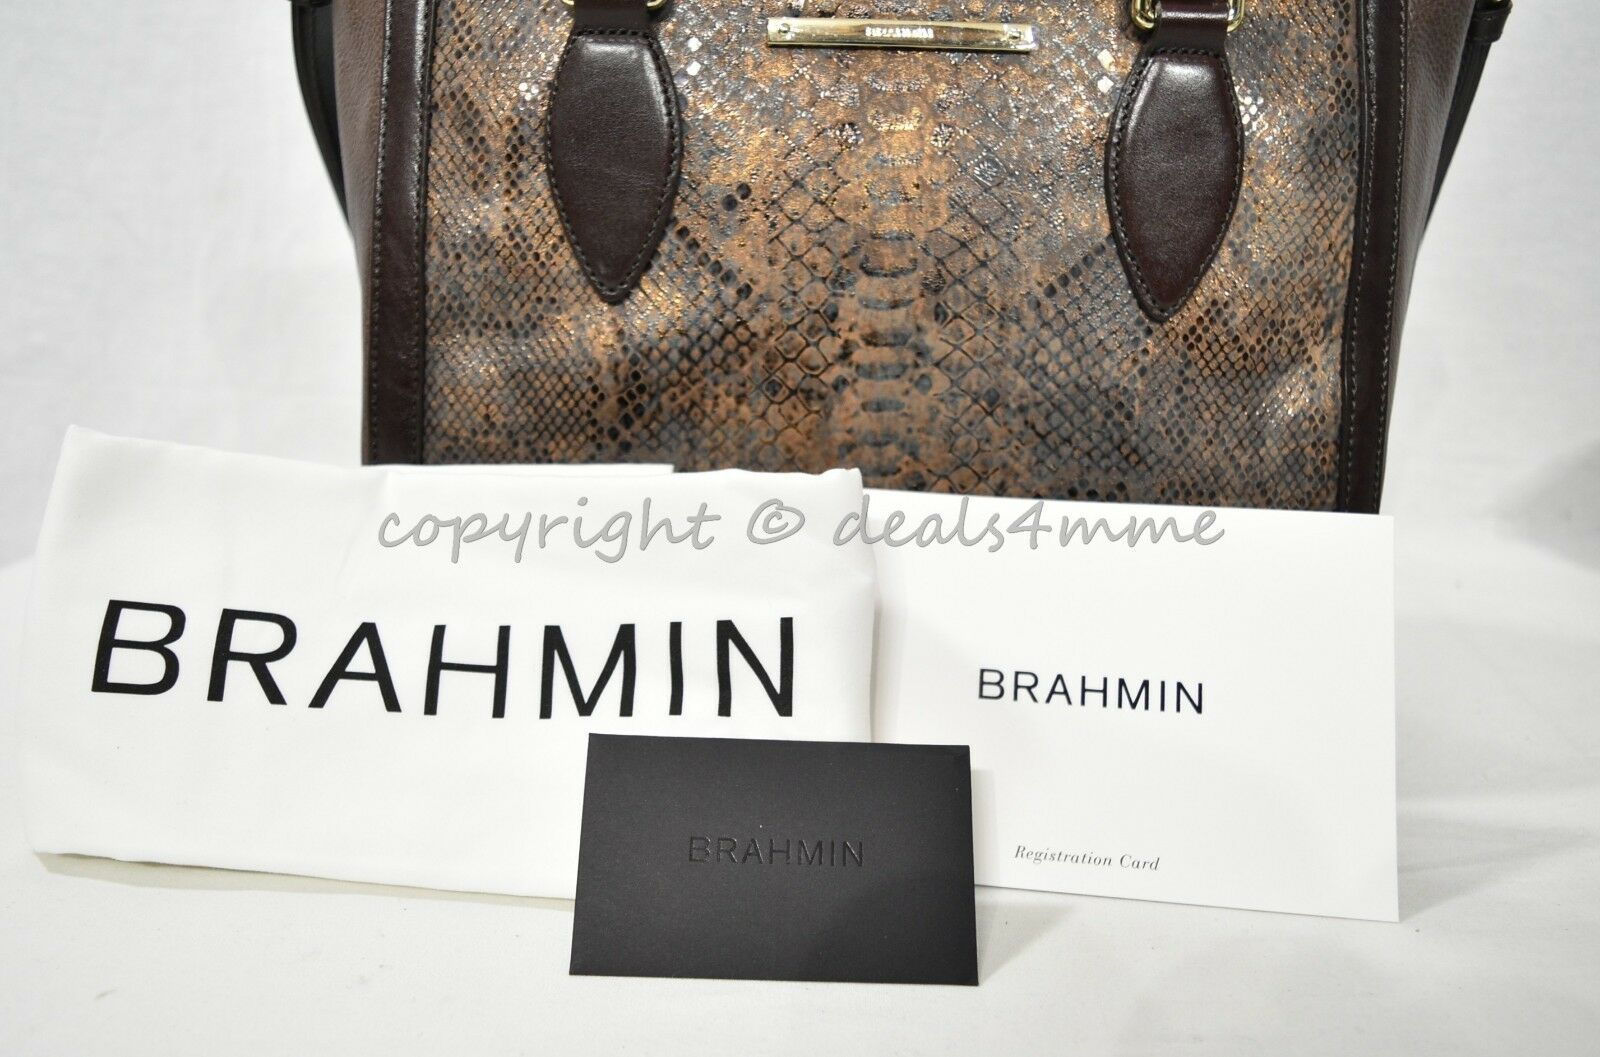 NWT Brahmin Small Lena Leather Satchel/Shoulder Bag in Brown Barrow image 11